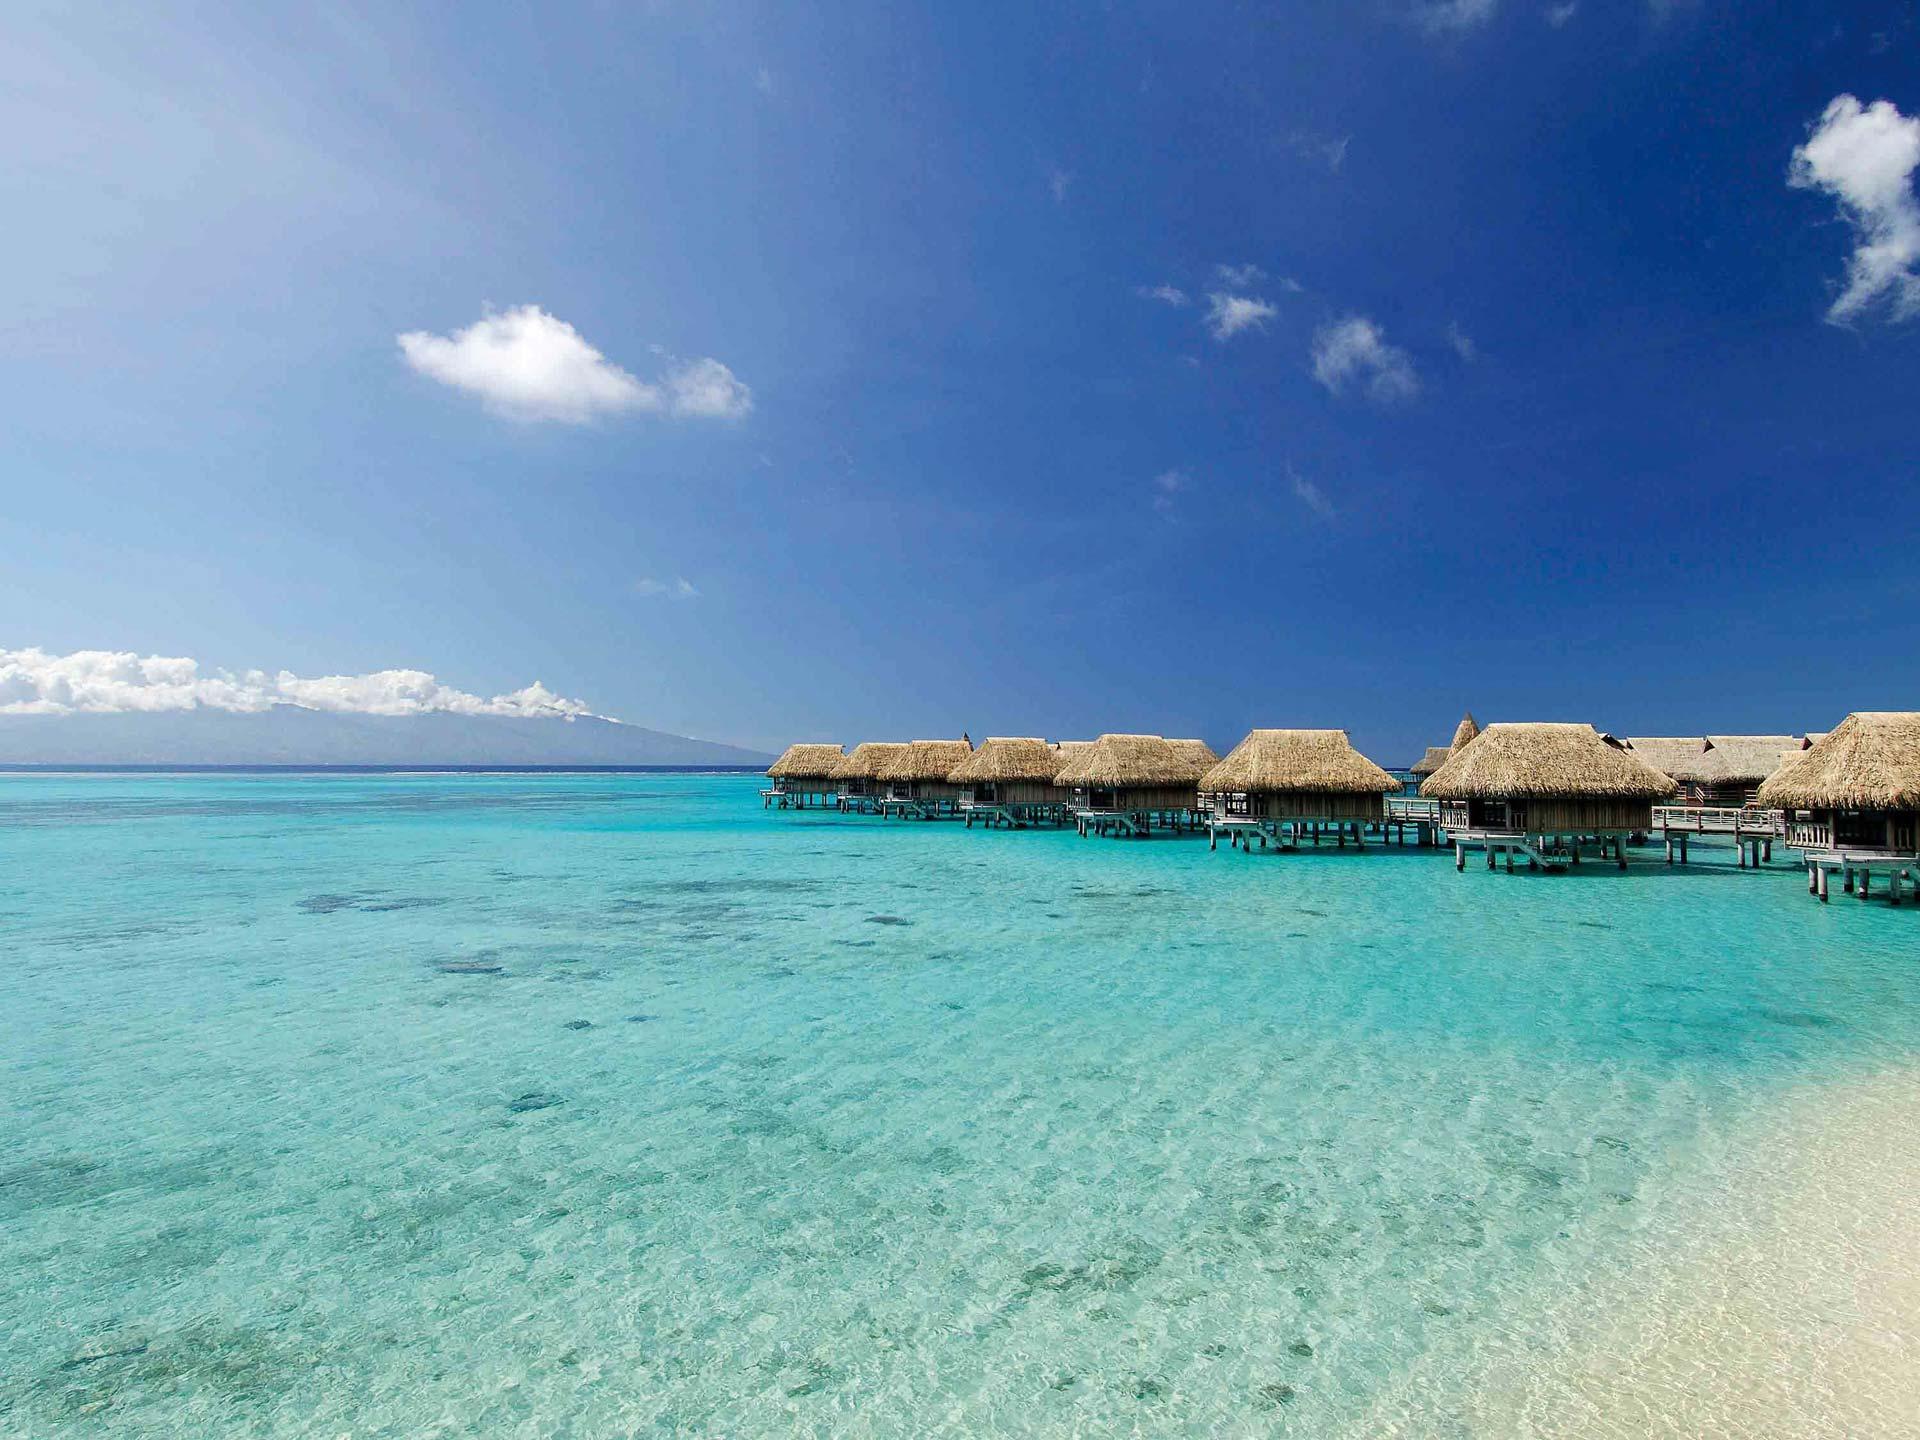 Sofitel Moorea Ia Ora Beach Resort Bungalows